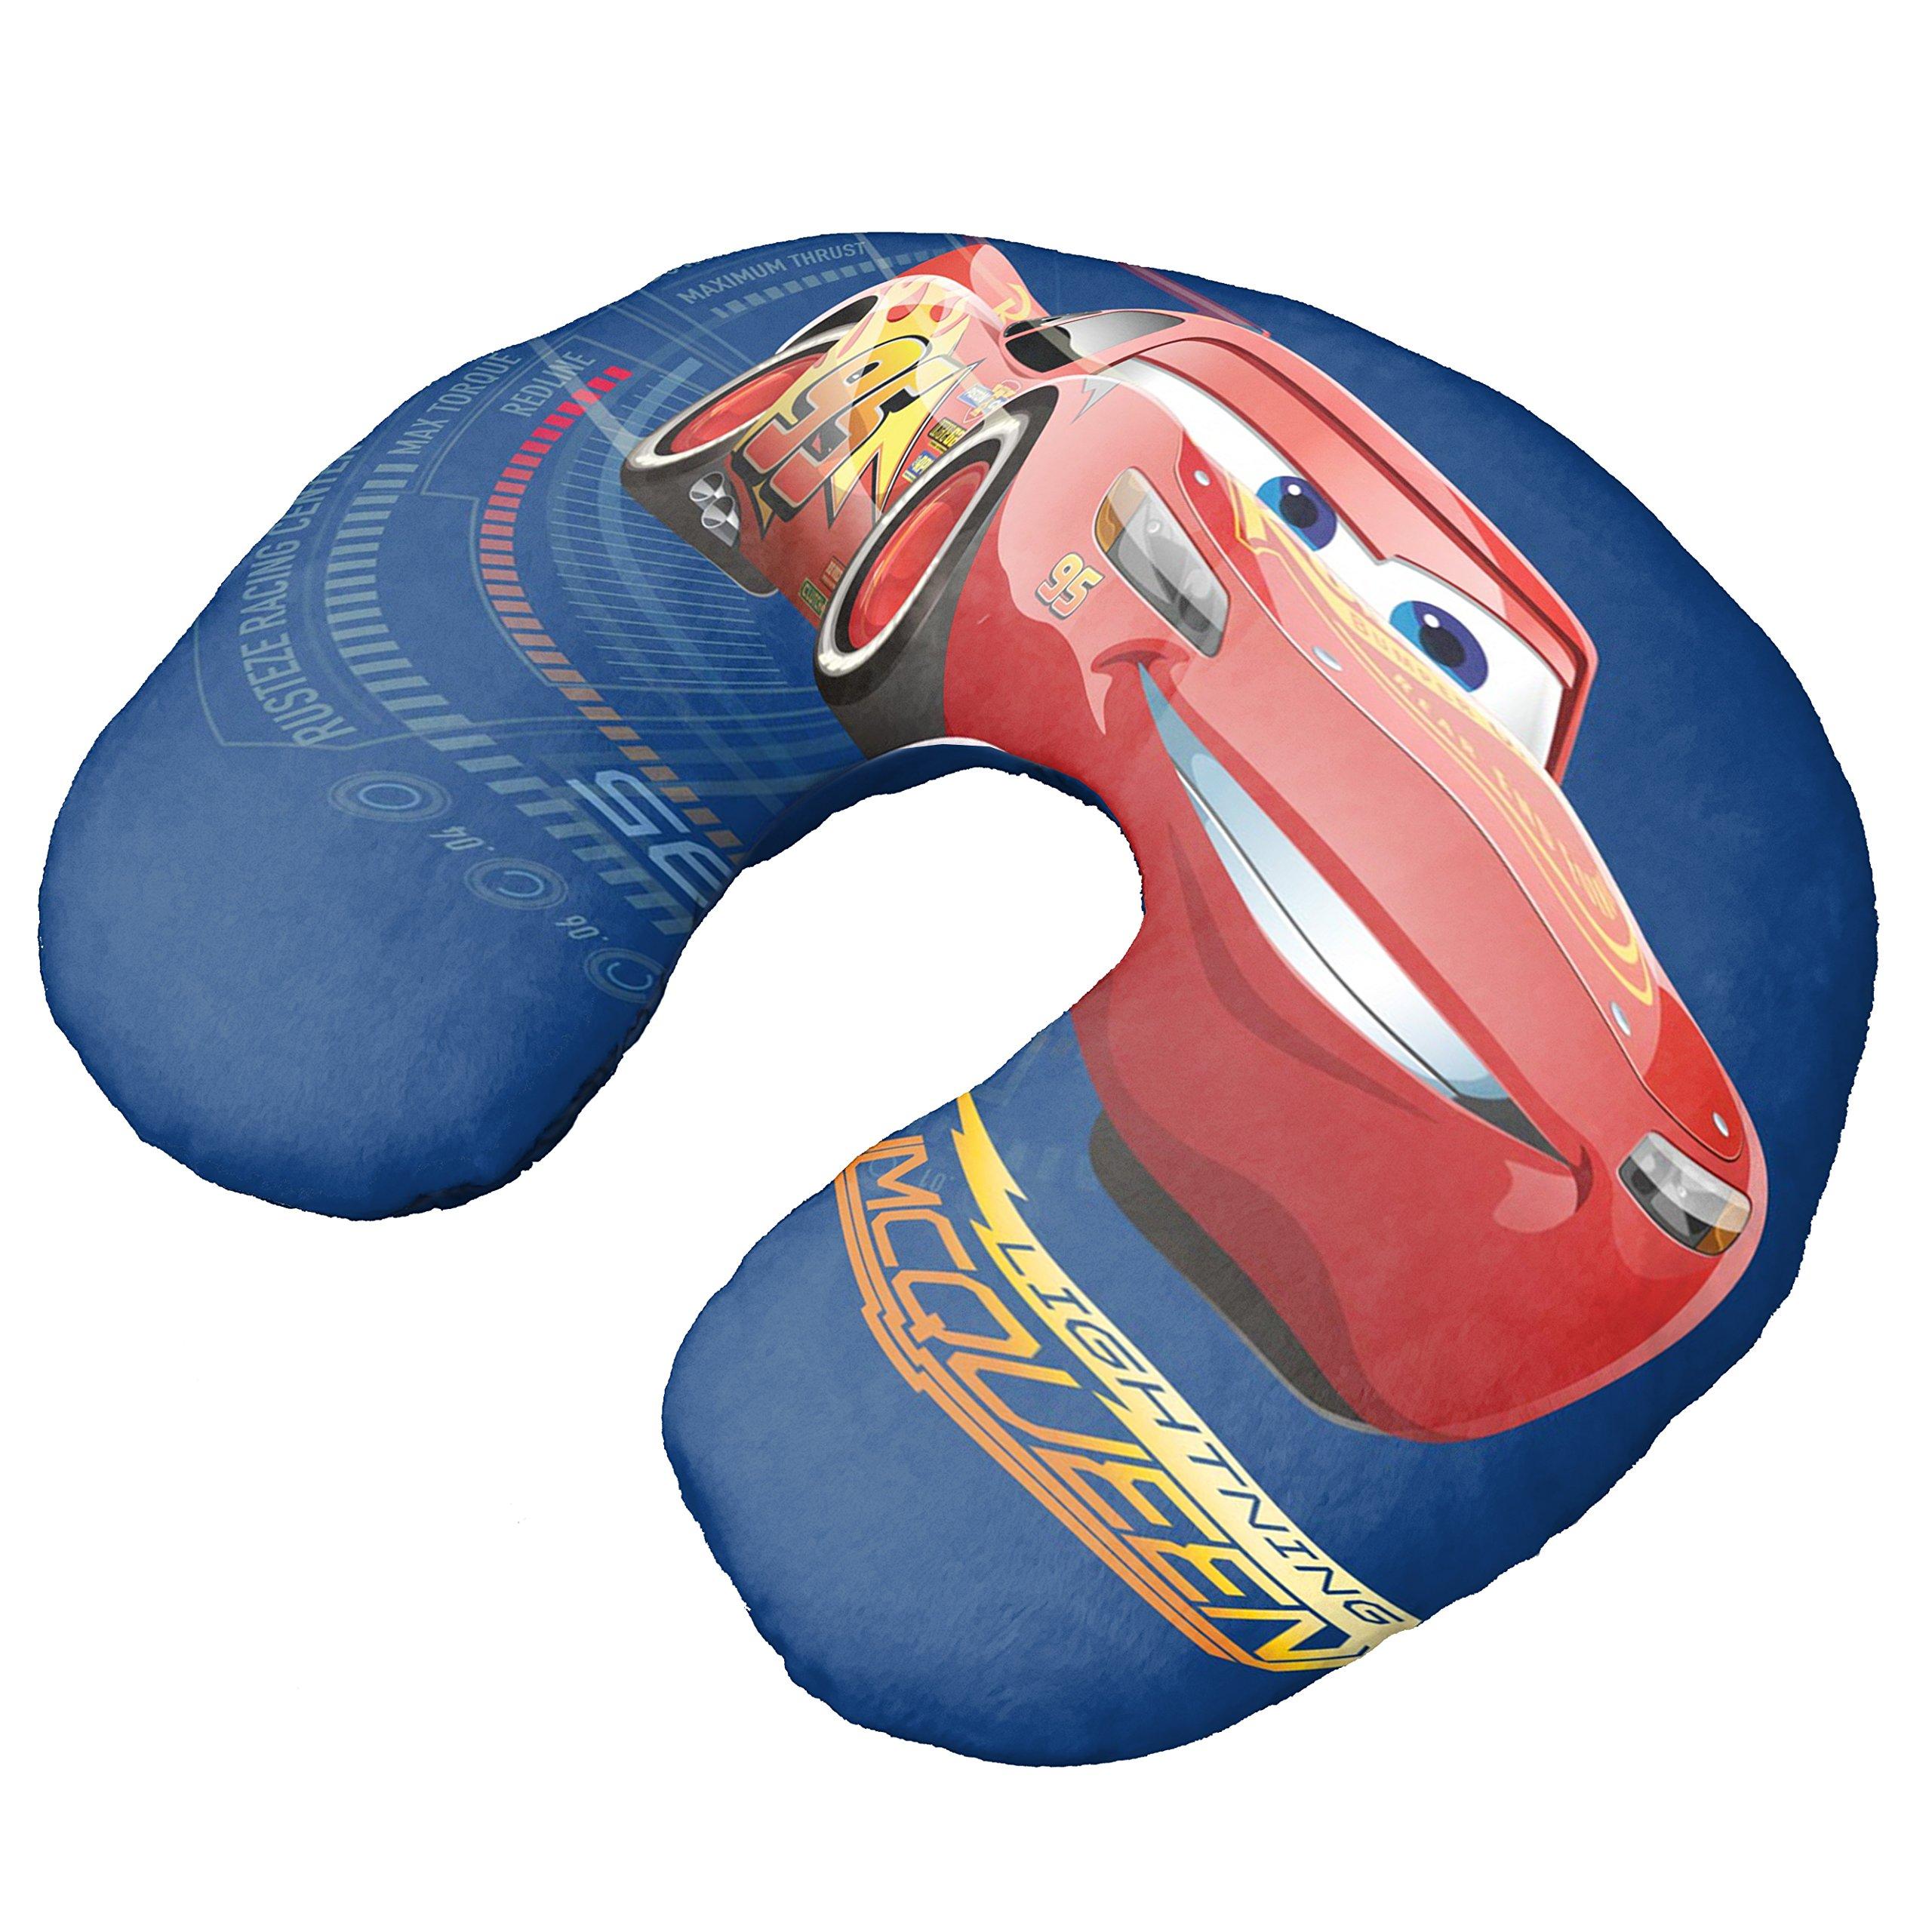 Disney/Pixar Cars 3 Movie Speed Lightning Mcqueen Blue Neck Pillow